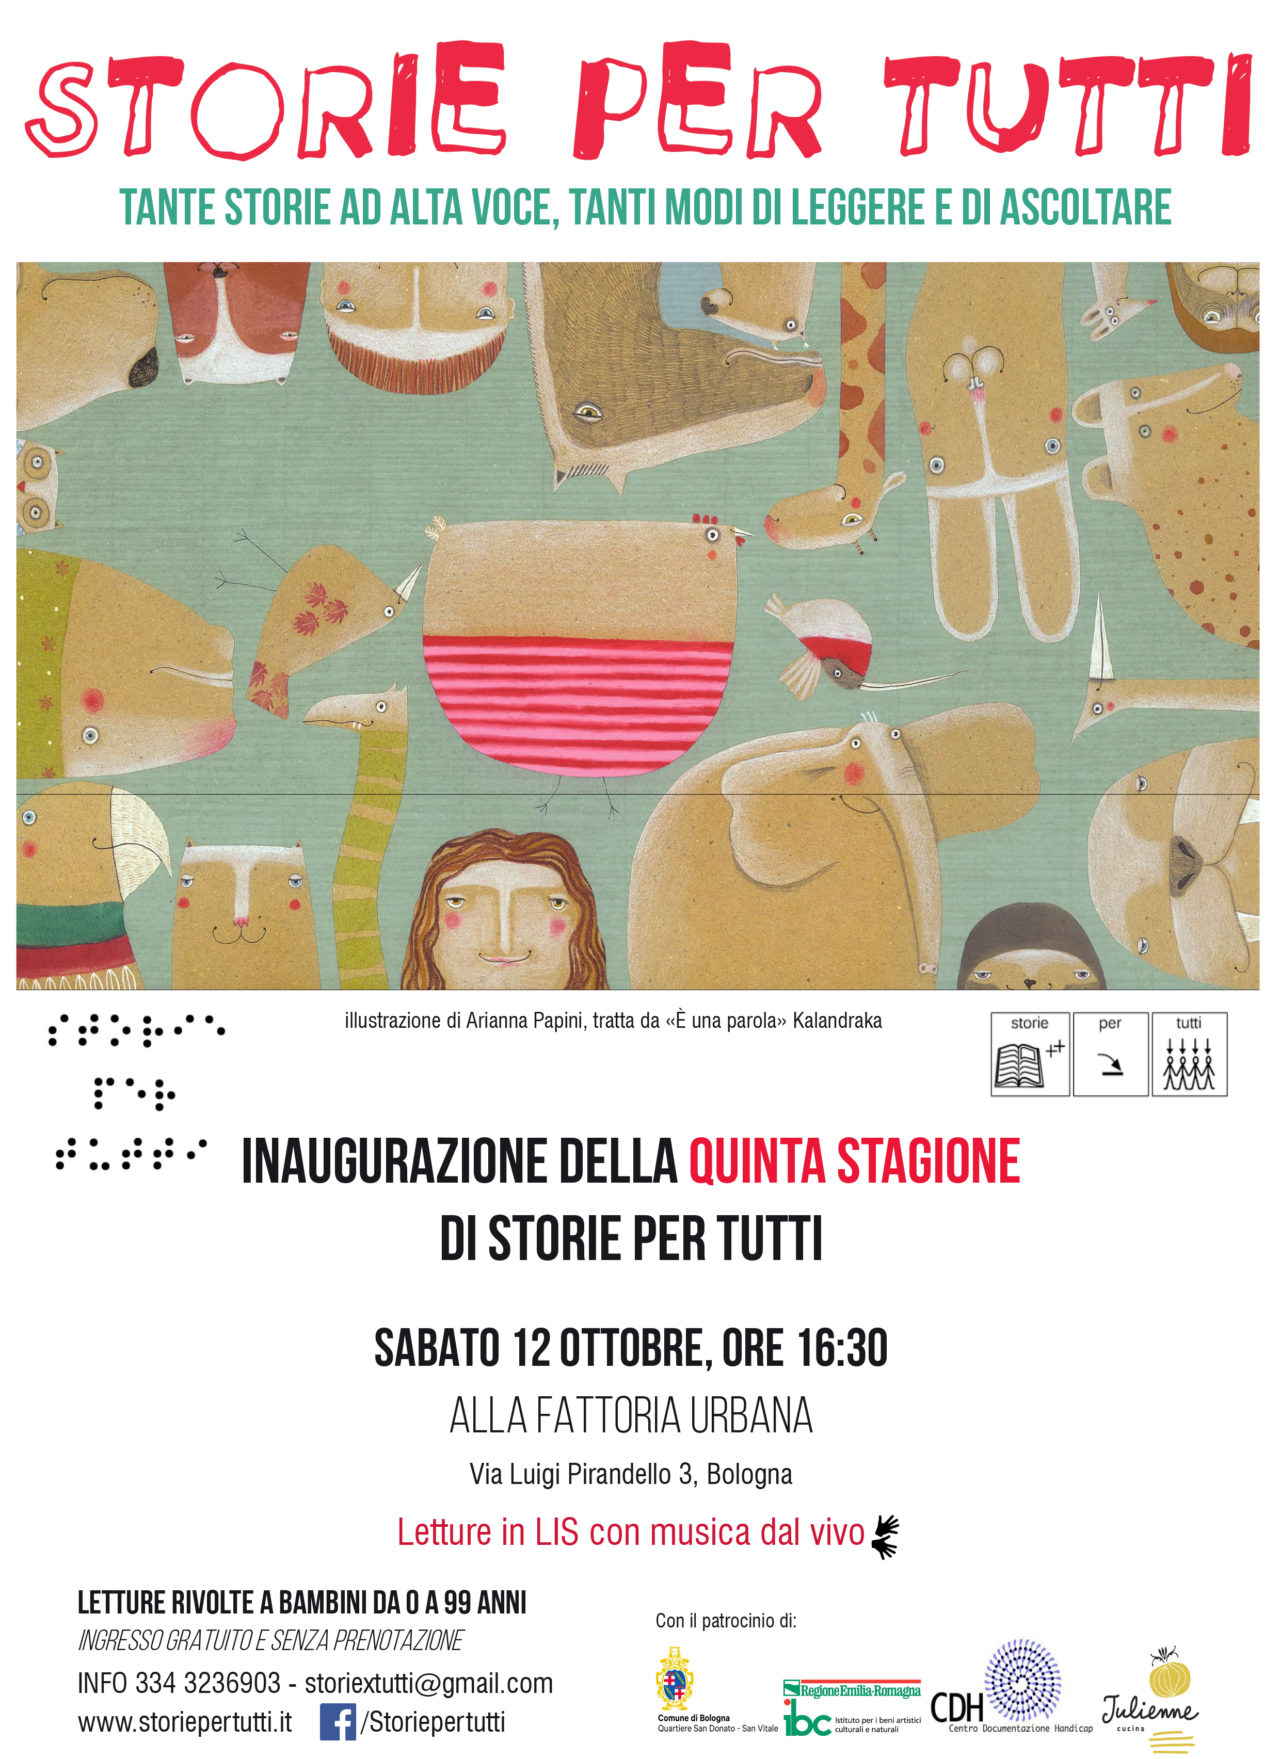 http://www.storiepertutti.it/wp-content/uploads/2019/10/STORIE-PER-TUTTI-inaugurazione-5-stagione-a-colore-1280x1759.jpg